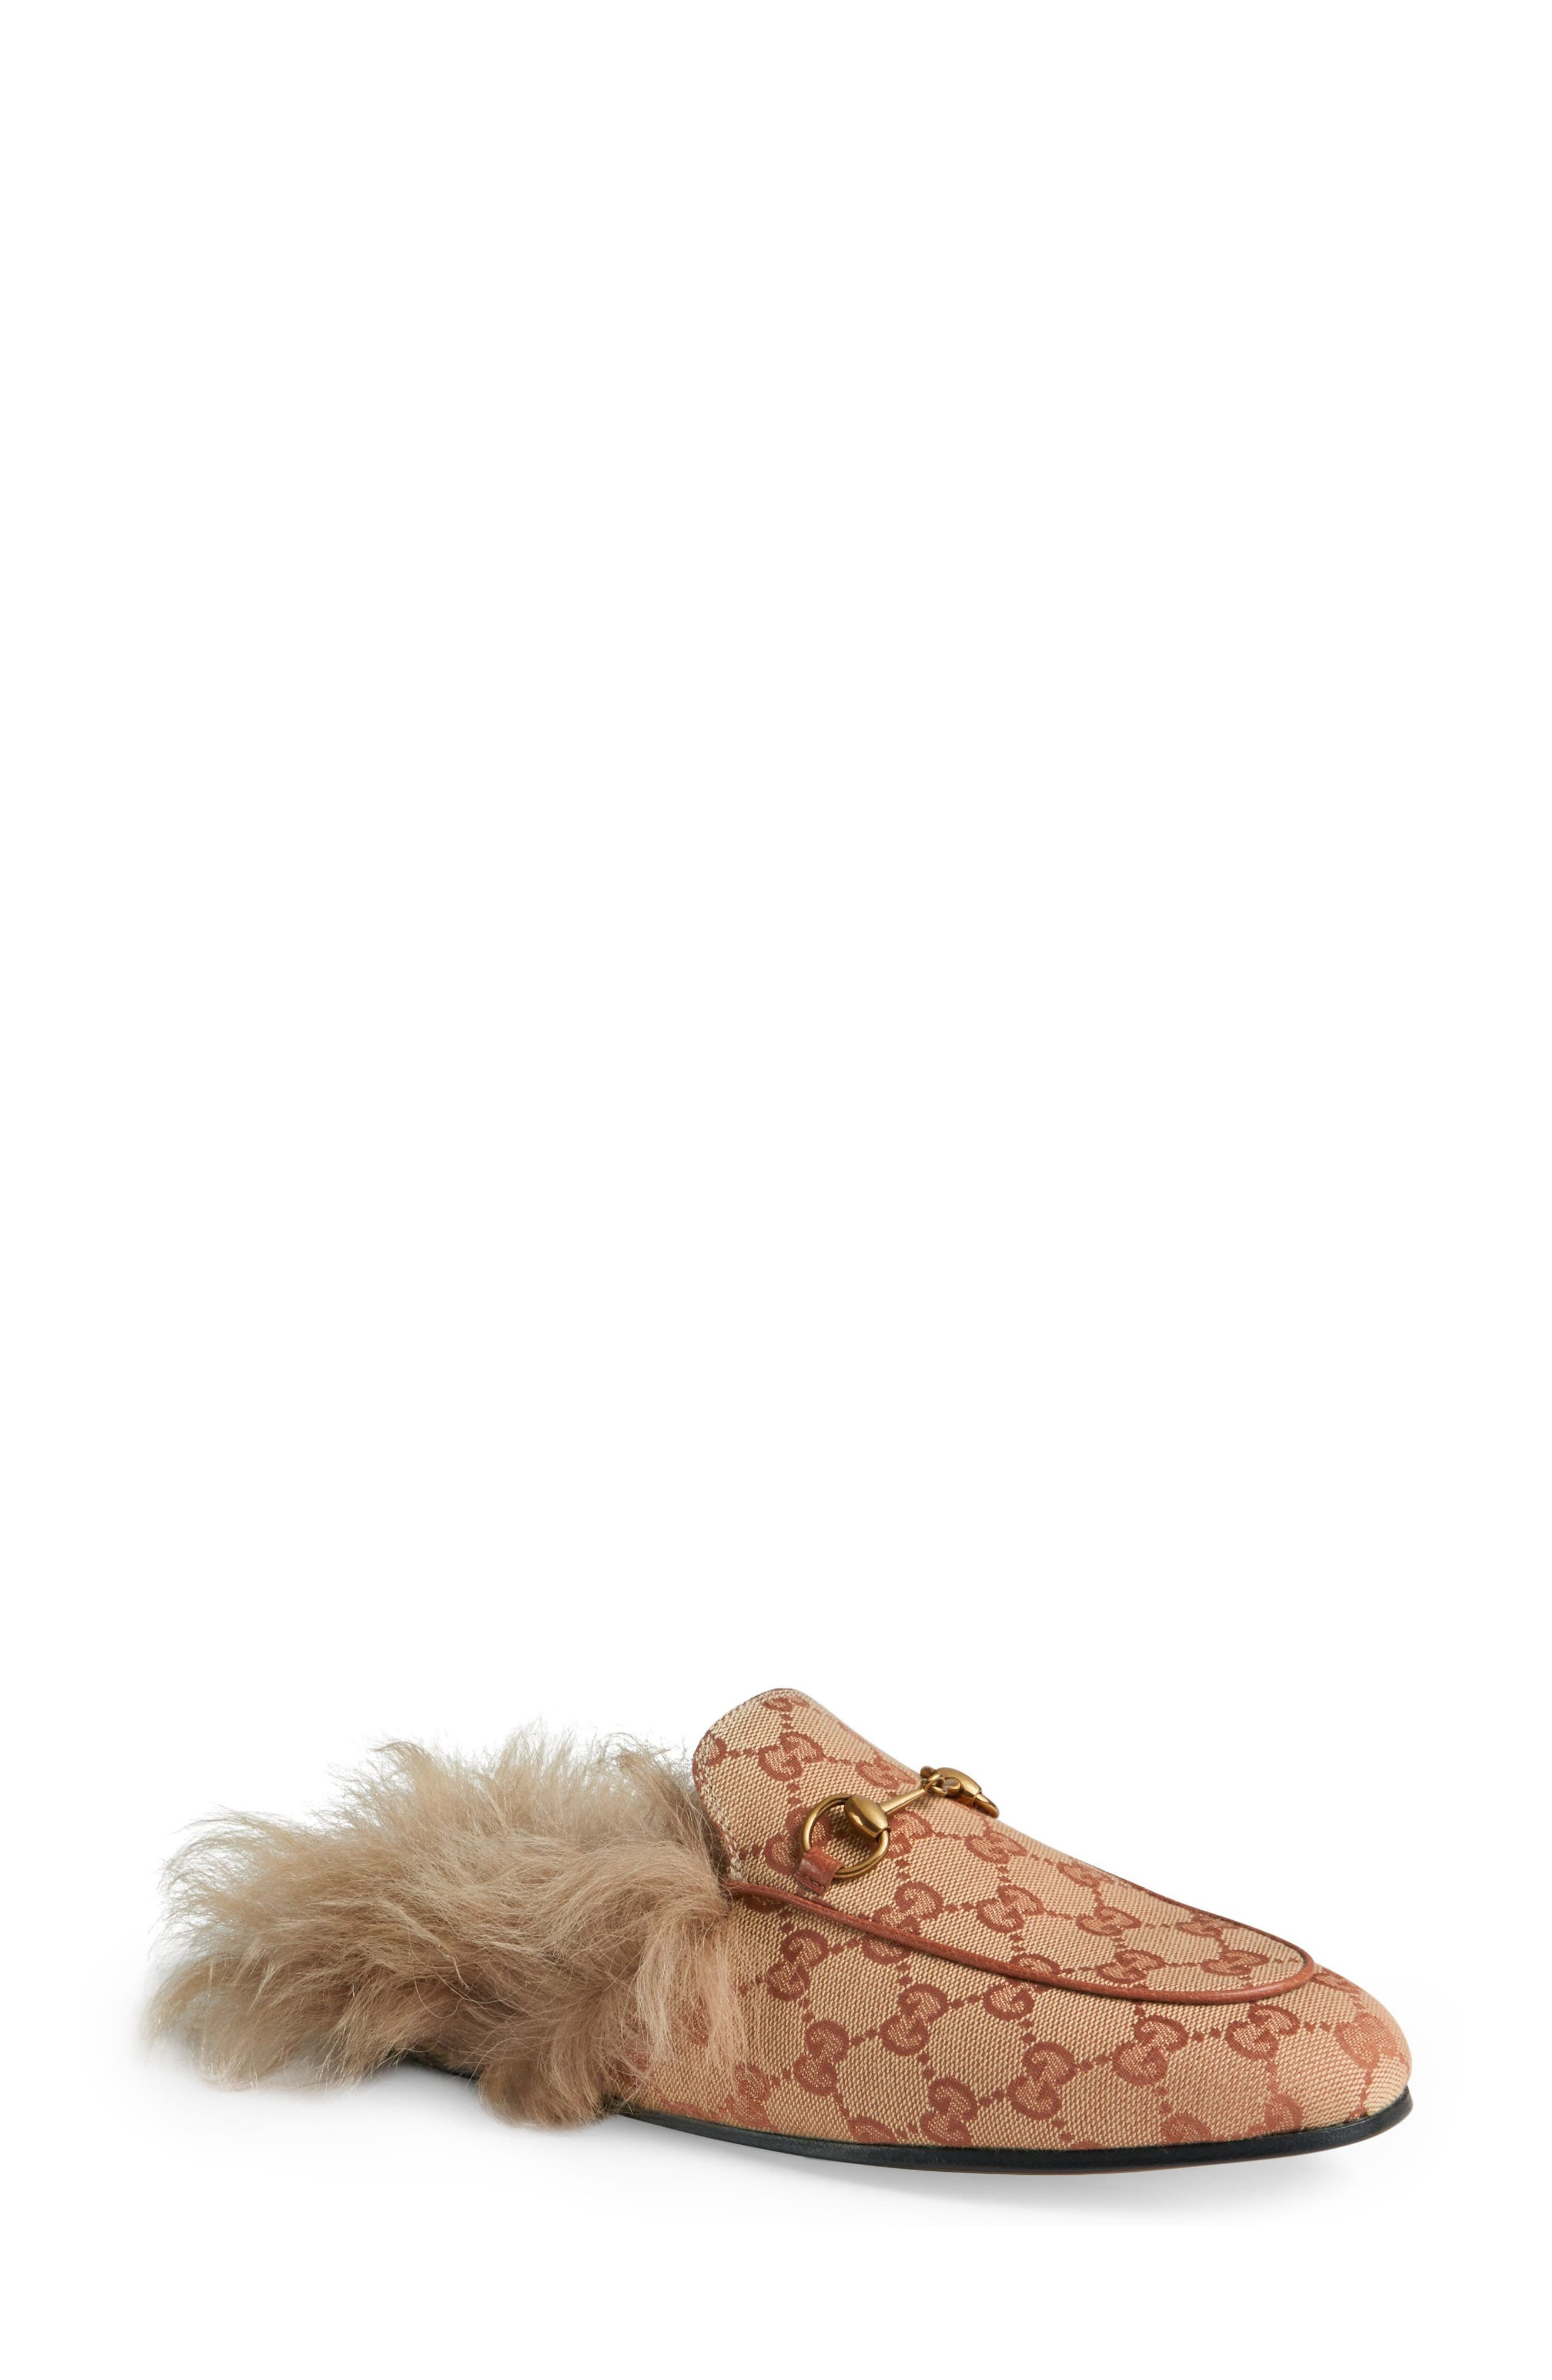 Gucci Princetown Genuine Shearling Logo Mule, Beige